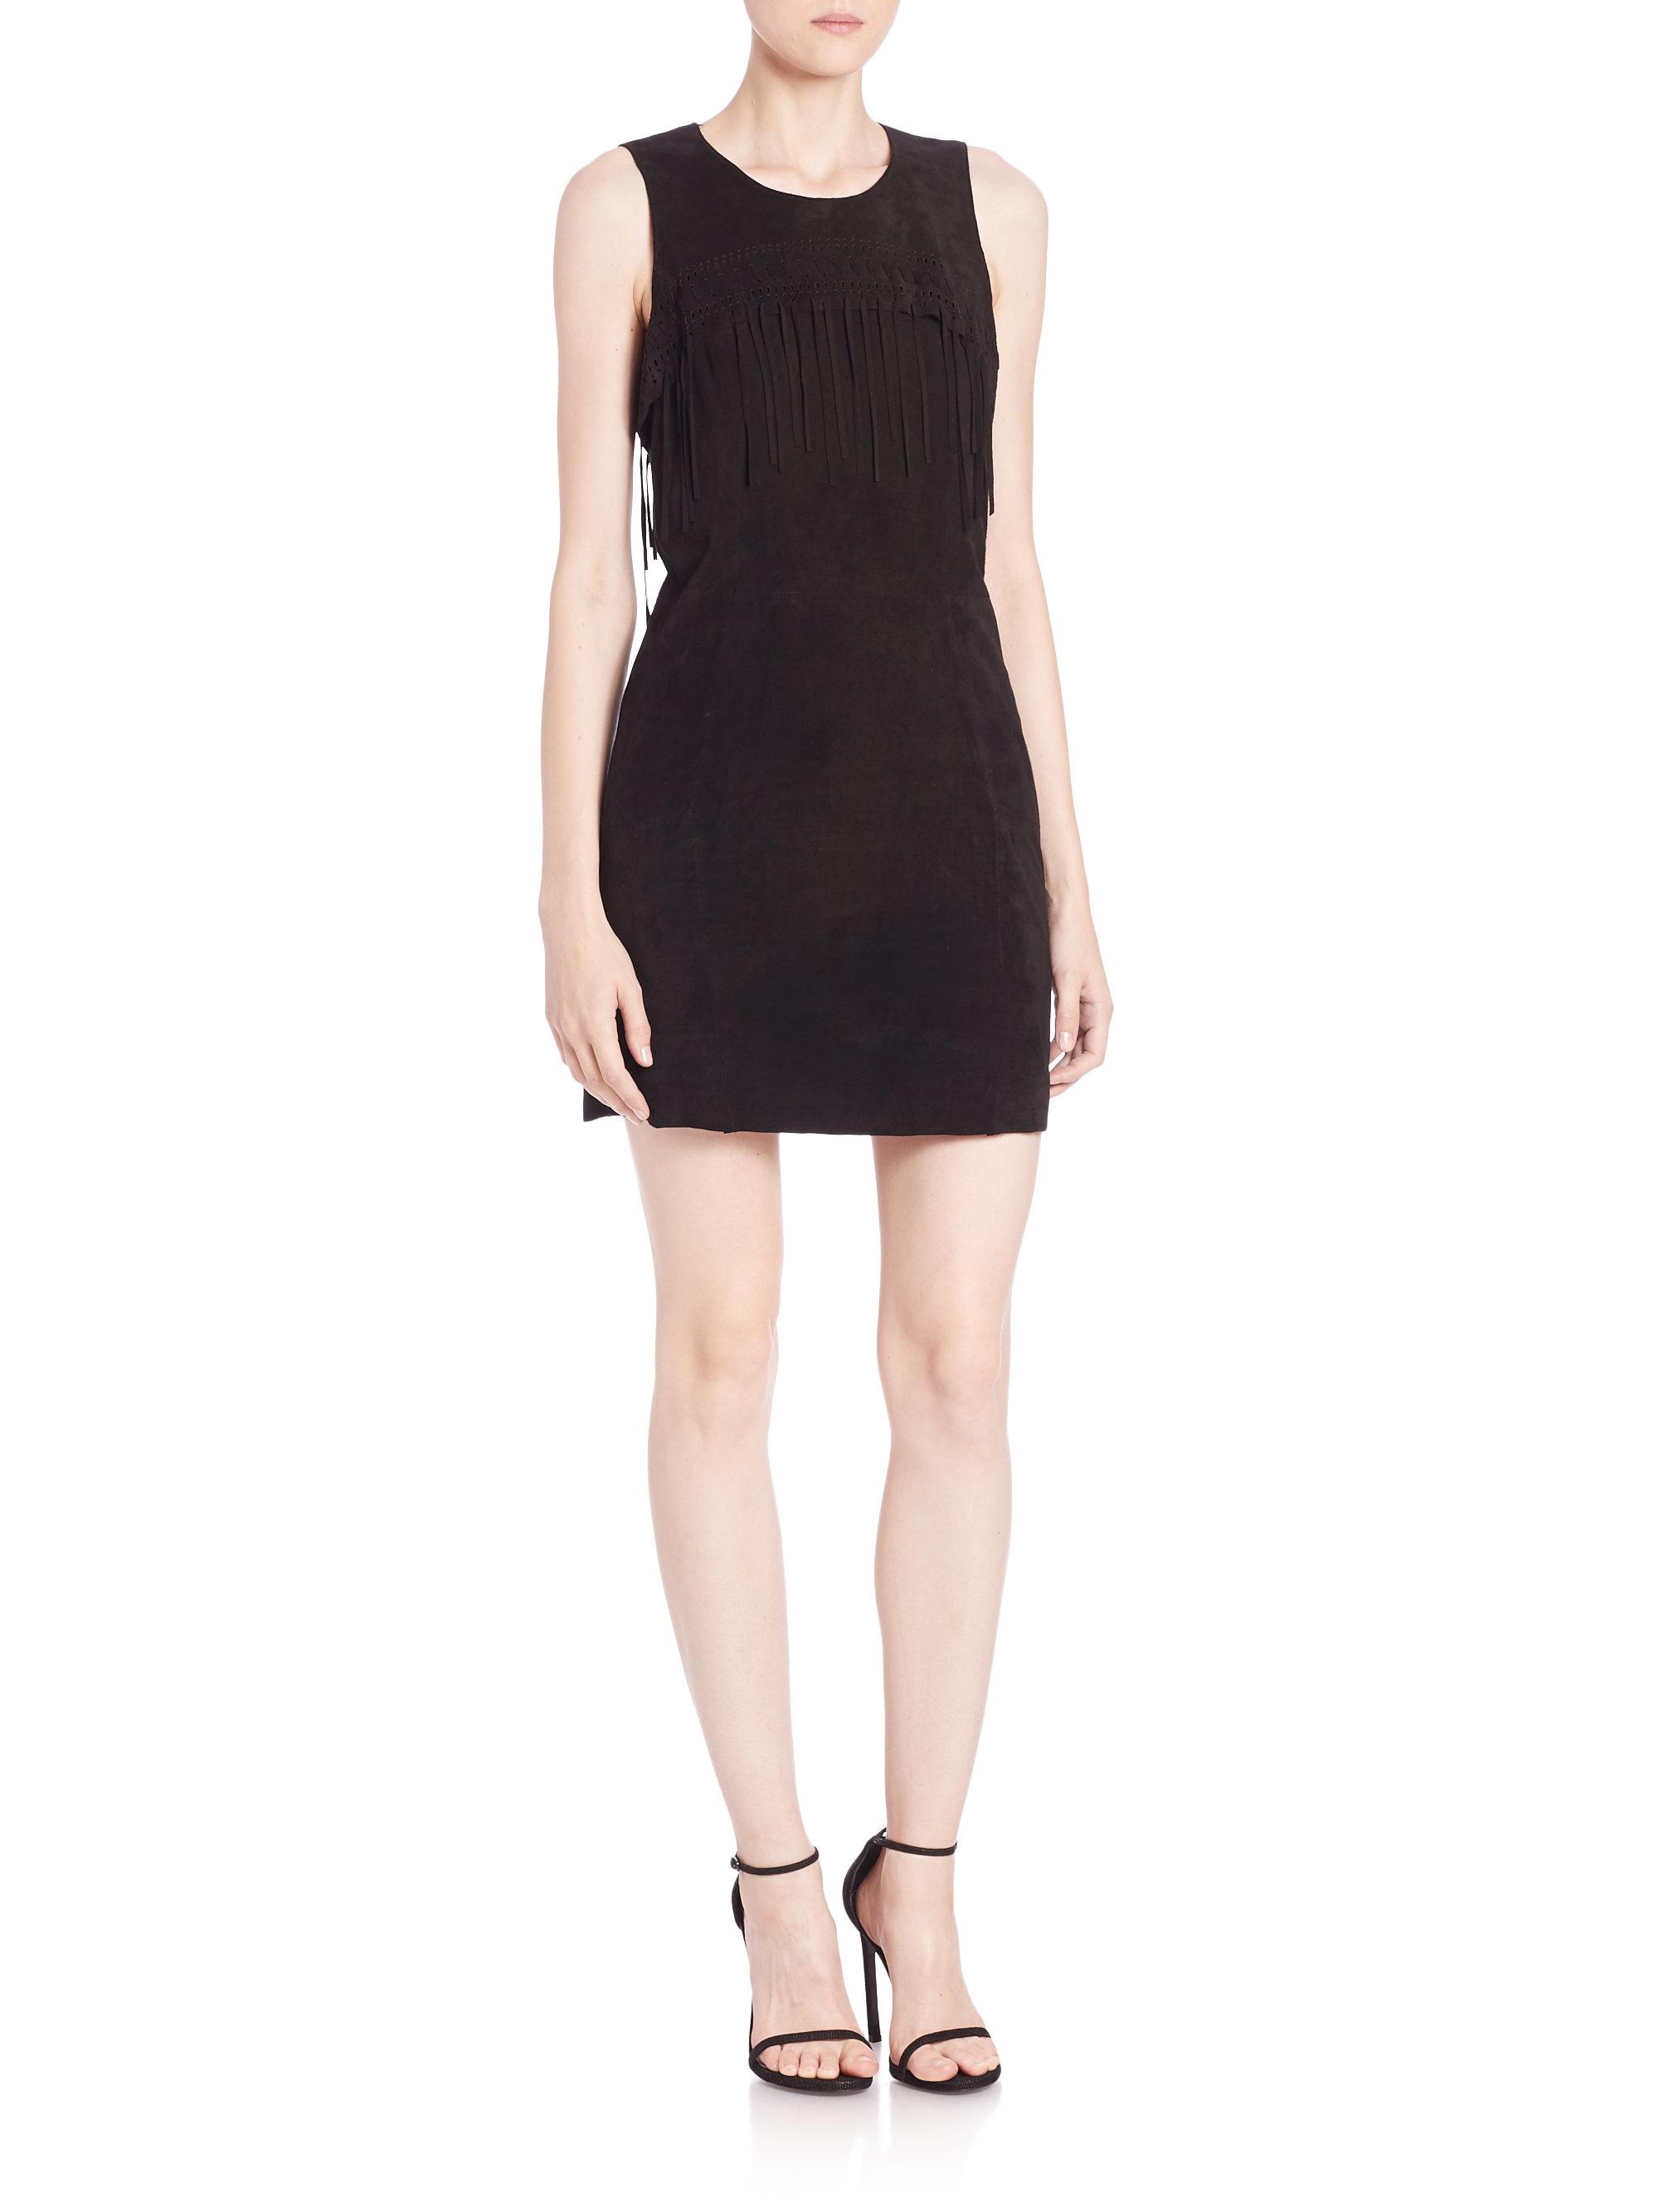 Lyst Rebecca Minkoff Suede Fringe Detail Dress In Black